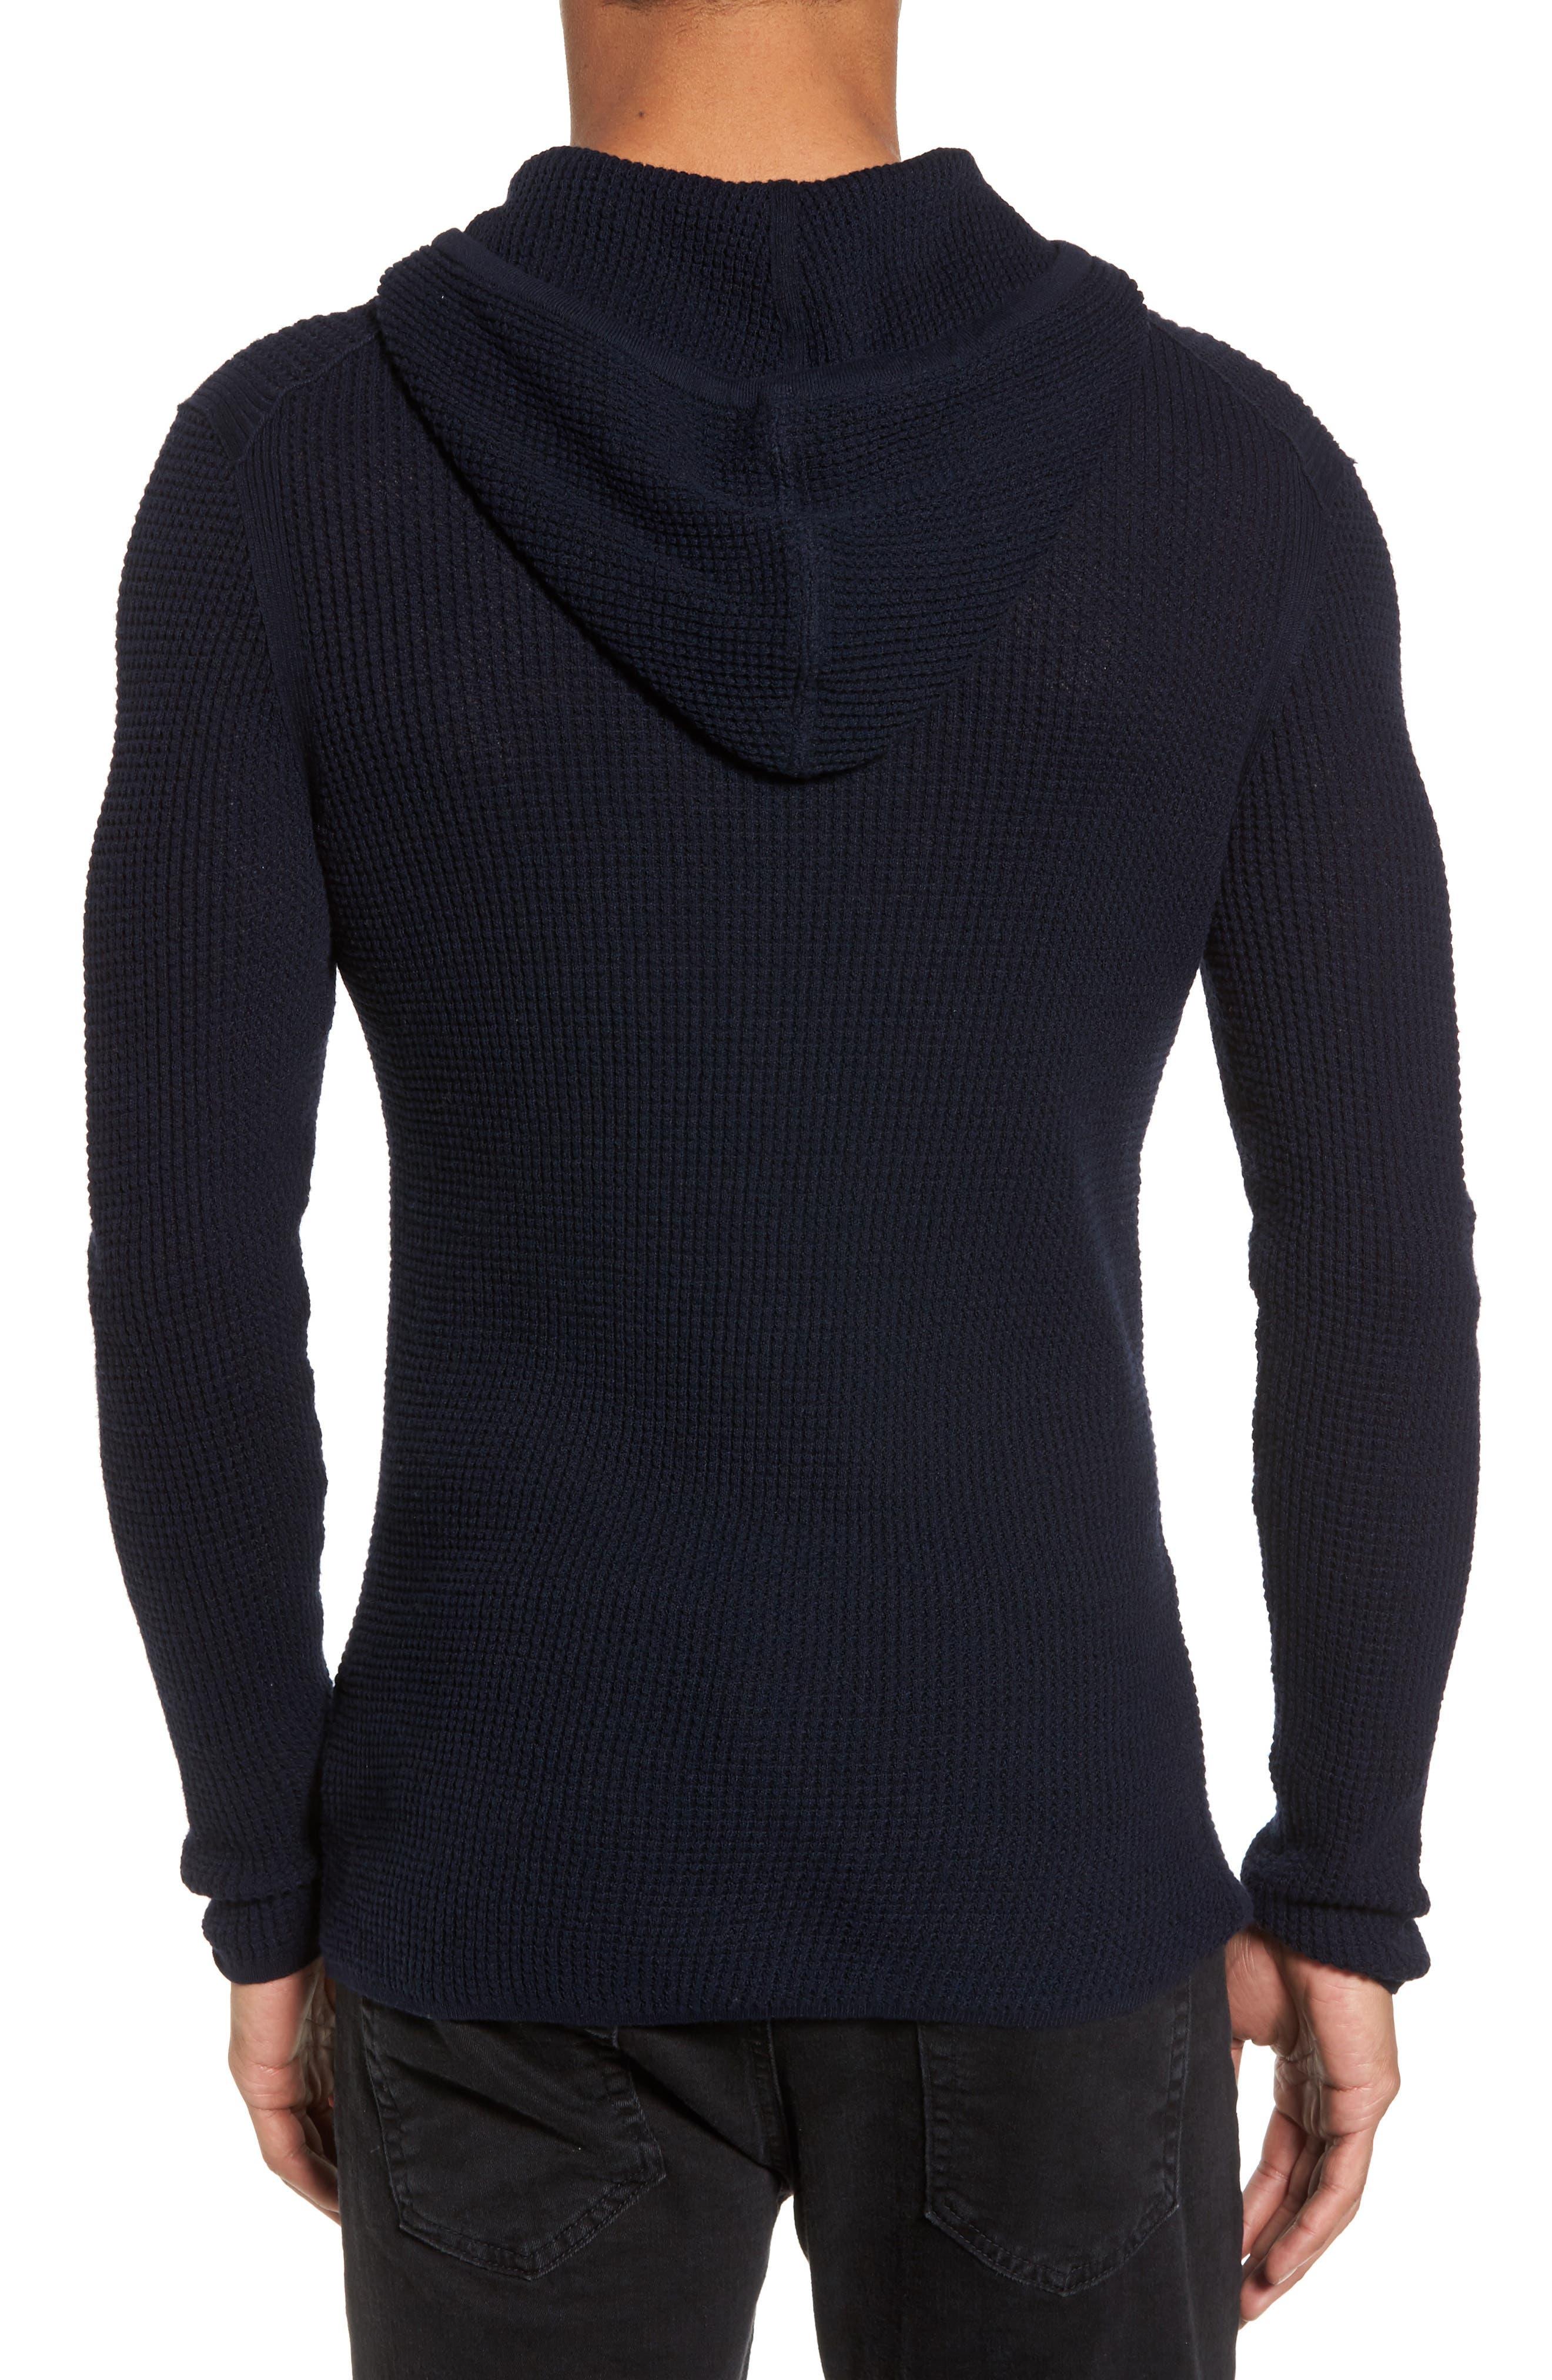 Thermal Pullover Hoodie,                             Alternate thumbnail 2, color,                             Marine